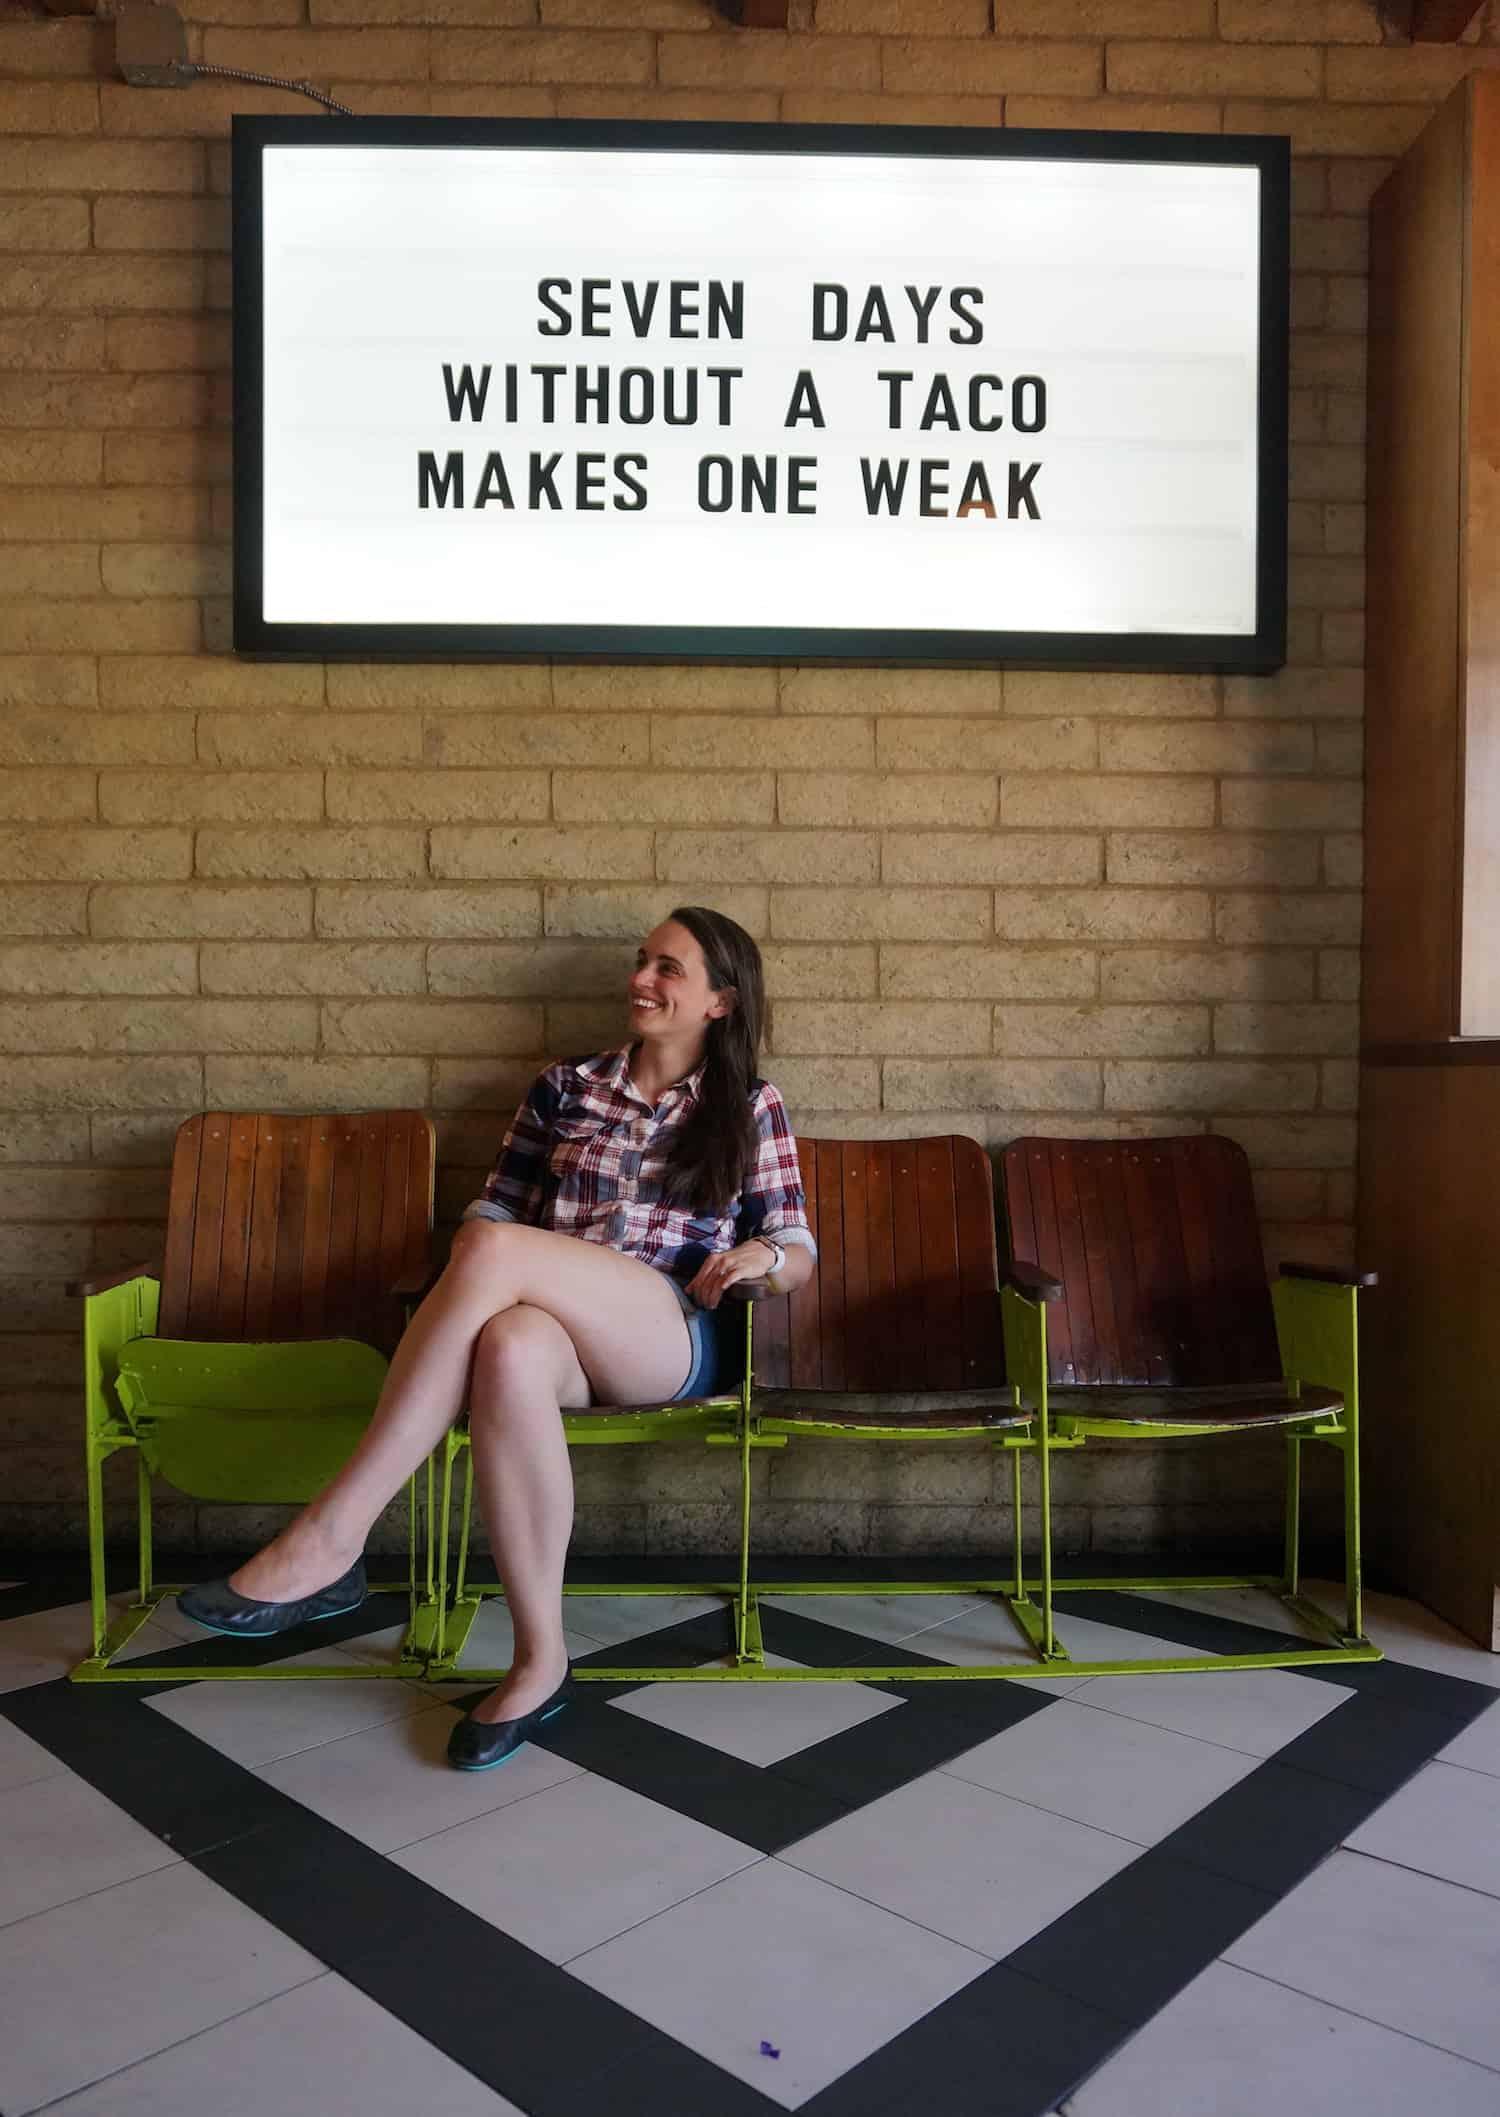 Scottsdale Food - Diego Pops